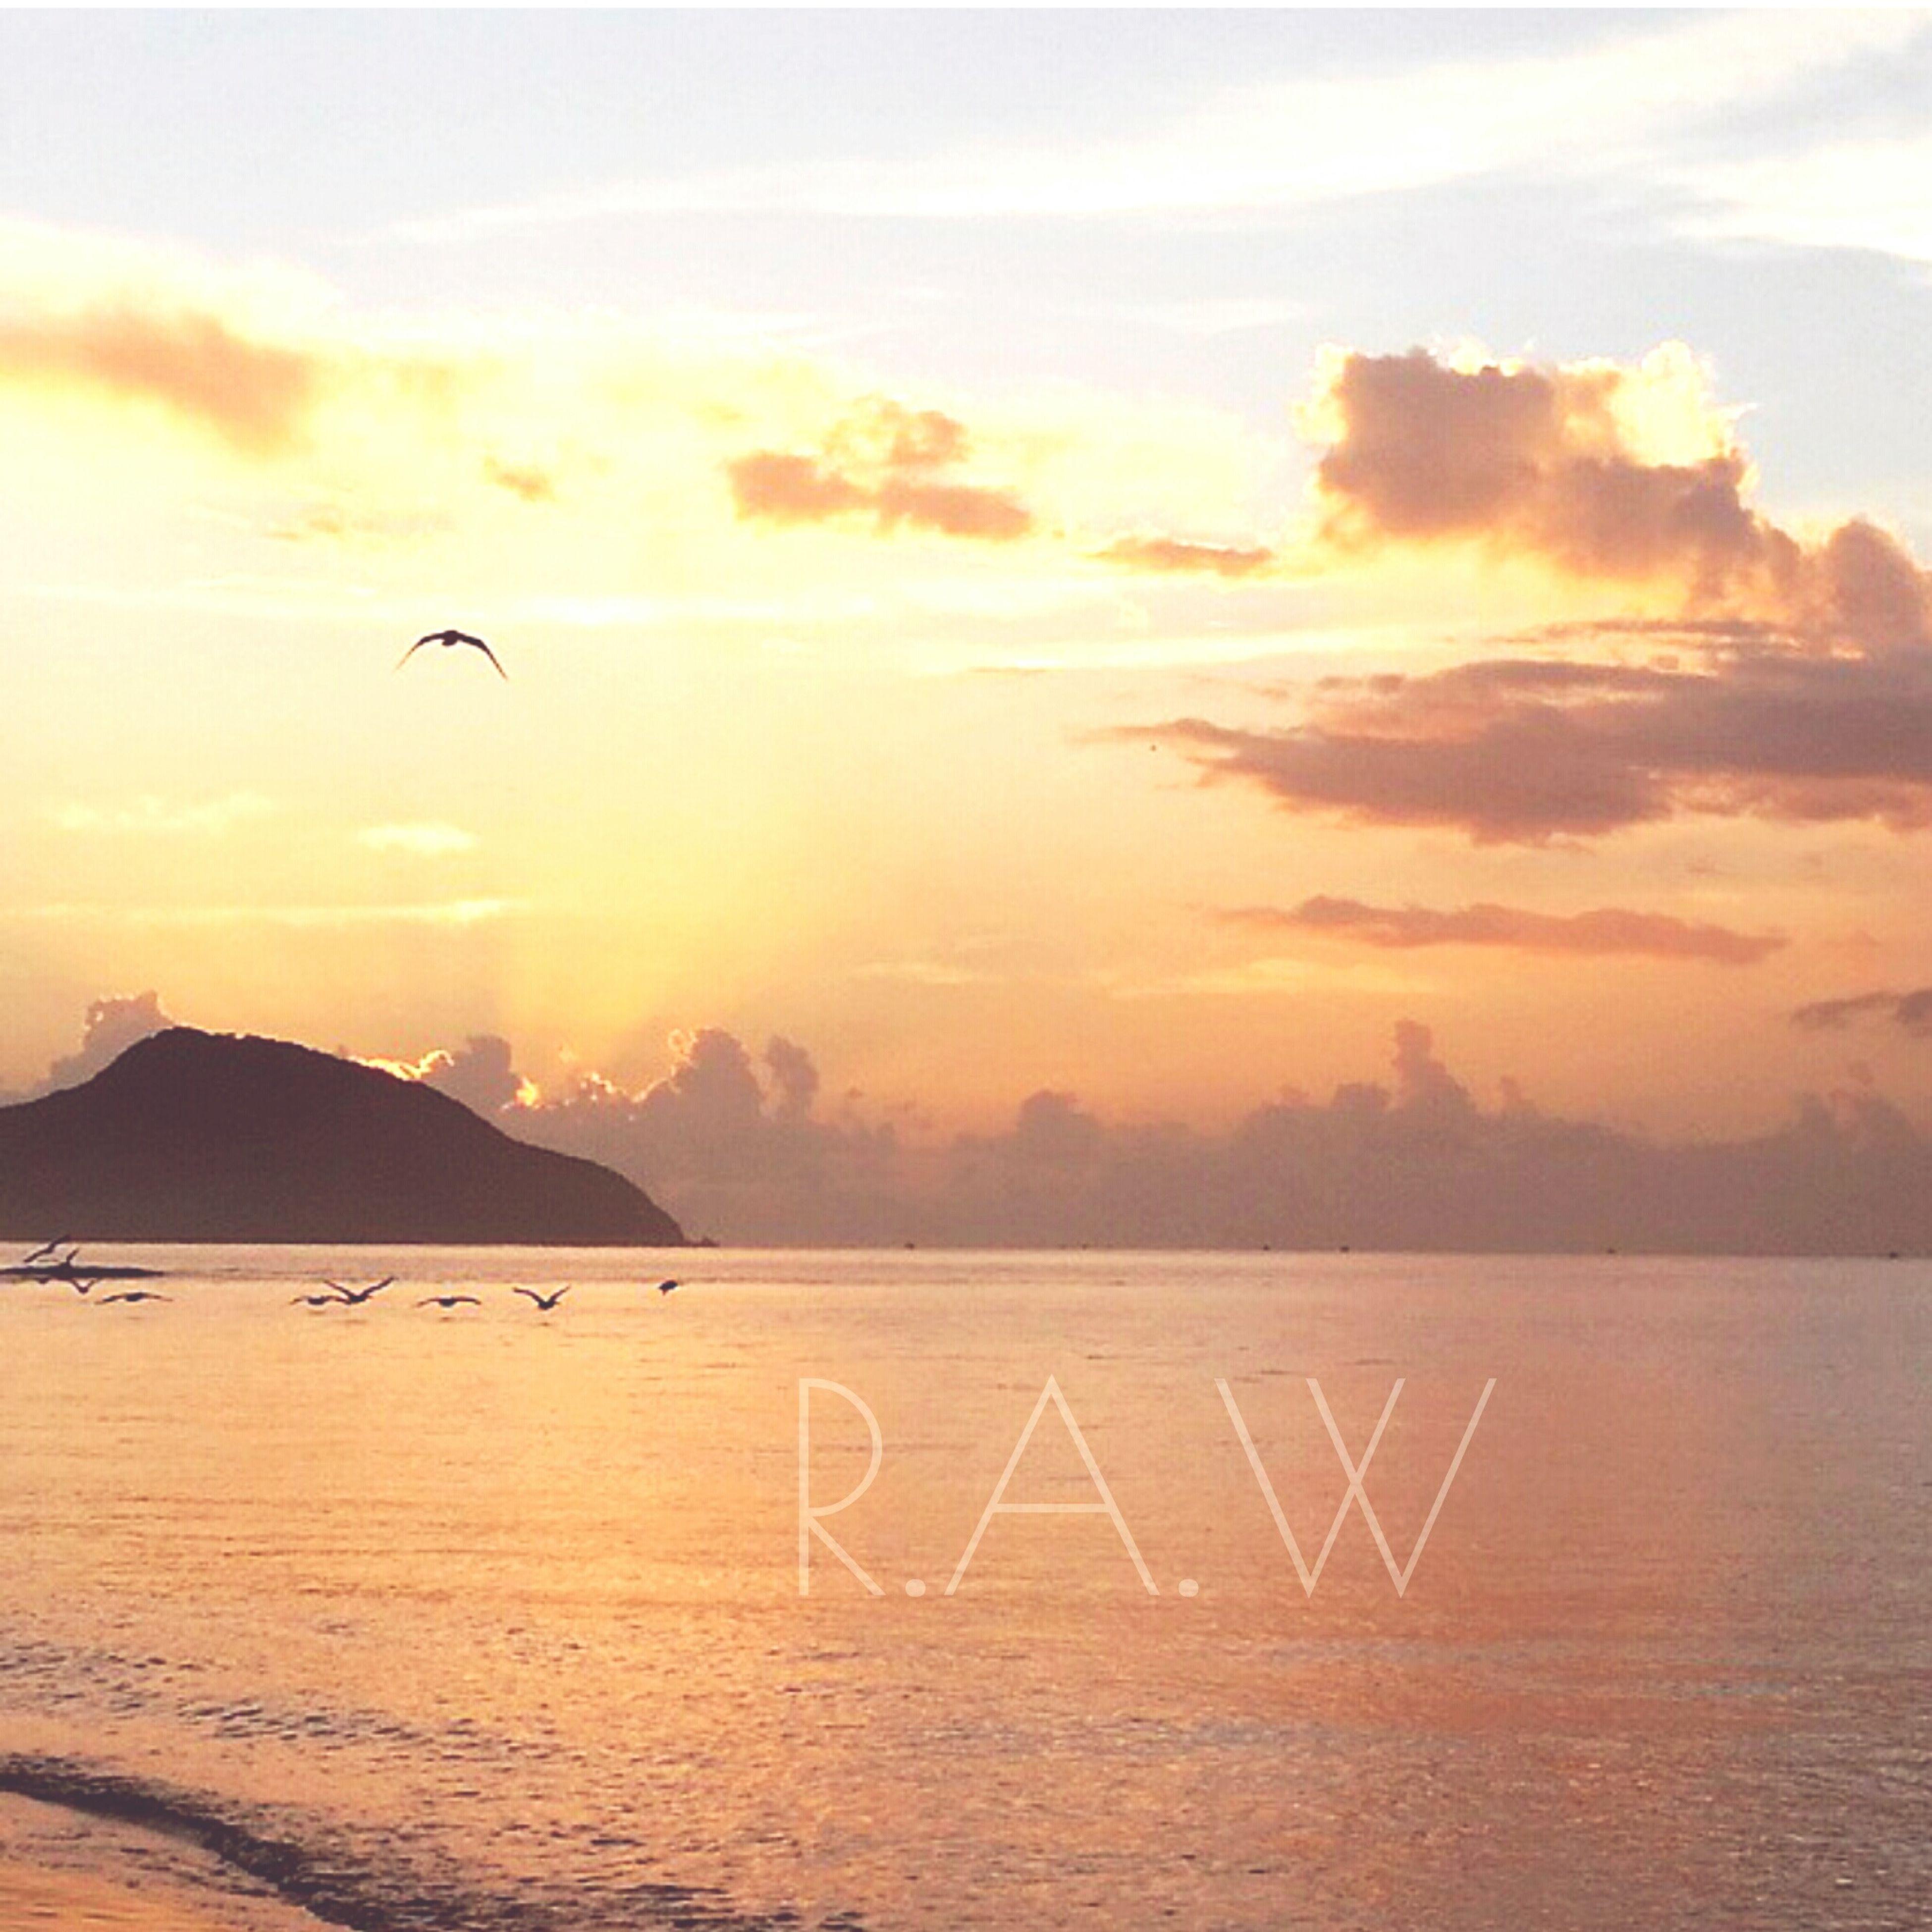 sunset, sky, scenics, mountain, tranquil scene, tranquility, beauty in nature, bird, water, flying, sea, nature, silhouette, cloud - sky, idyllic, orange color, mountain range, sun, cloud, animal themes